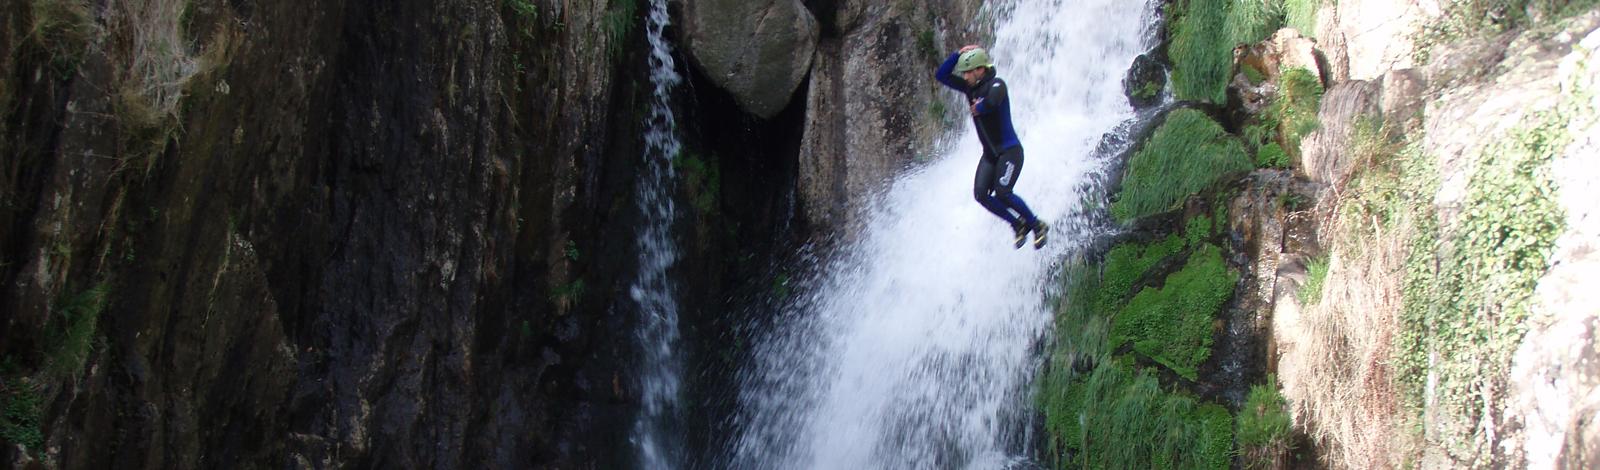 topo canyoning 5